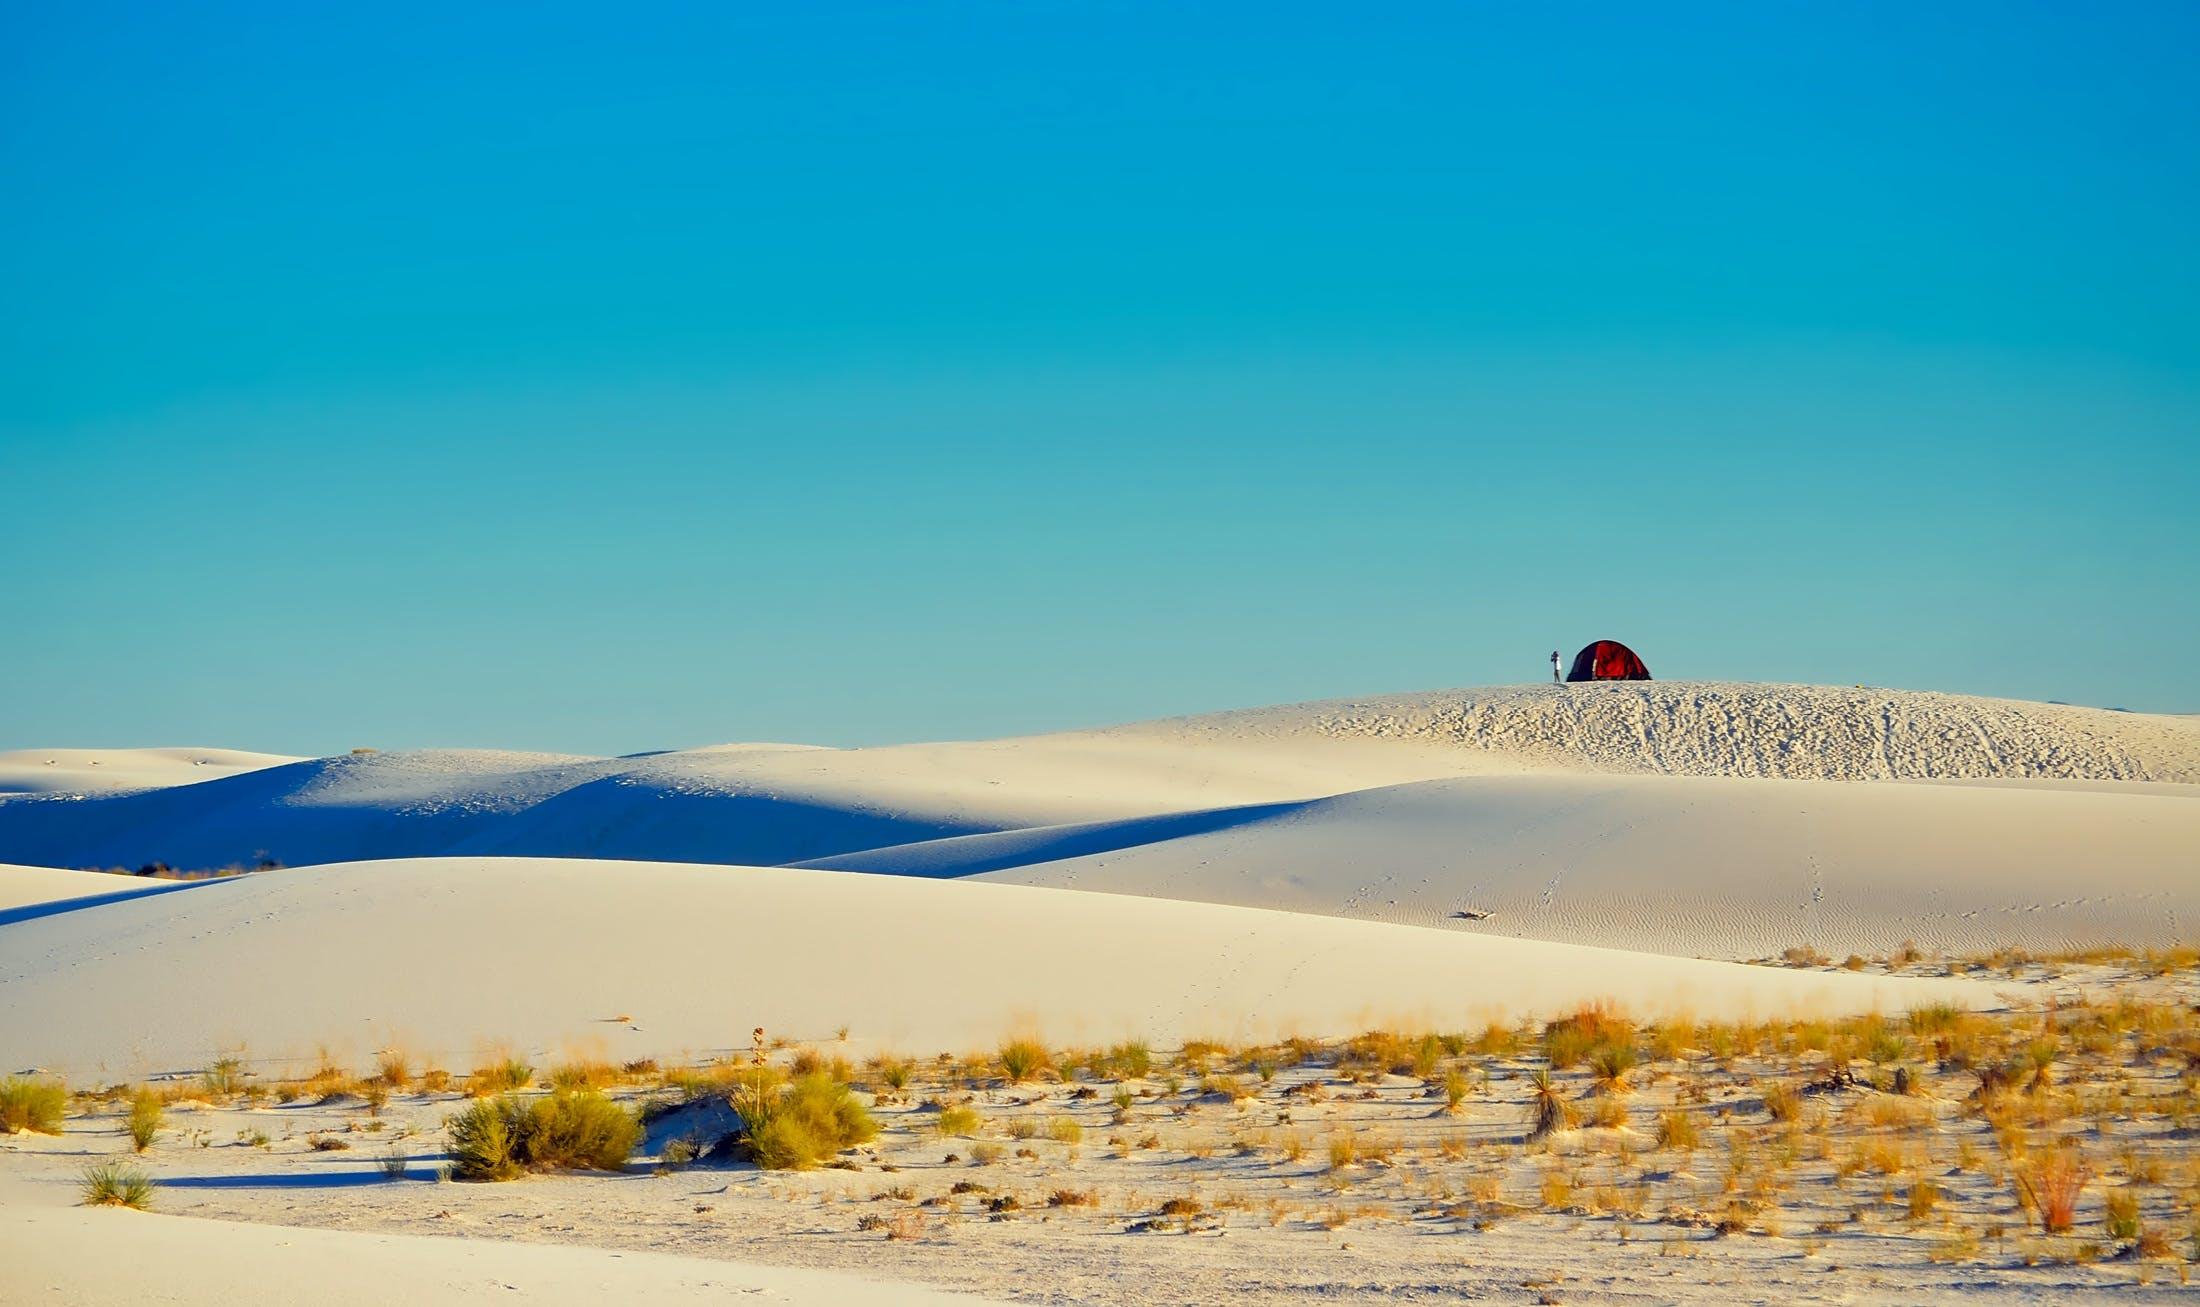 Kostenloses Stock Foto zu blauer himmel, campingplatz, draußen, dünen